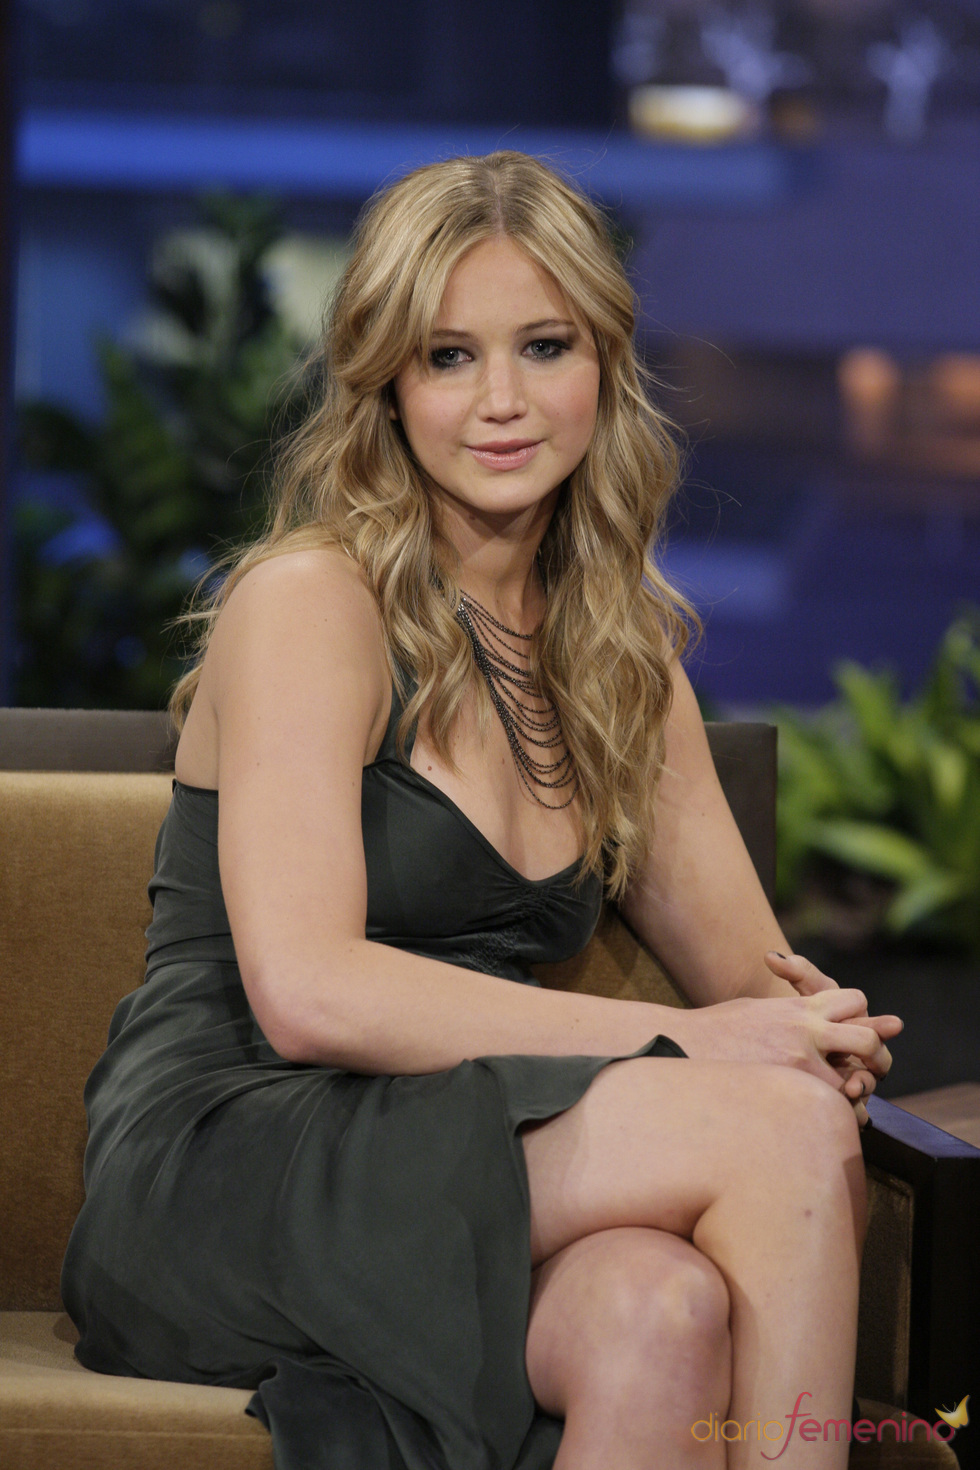 Jennifer Lawrence, actriz revelación de Hollywood